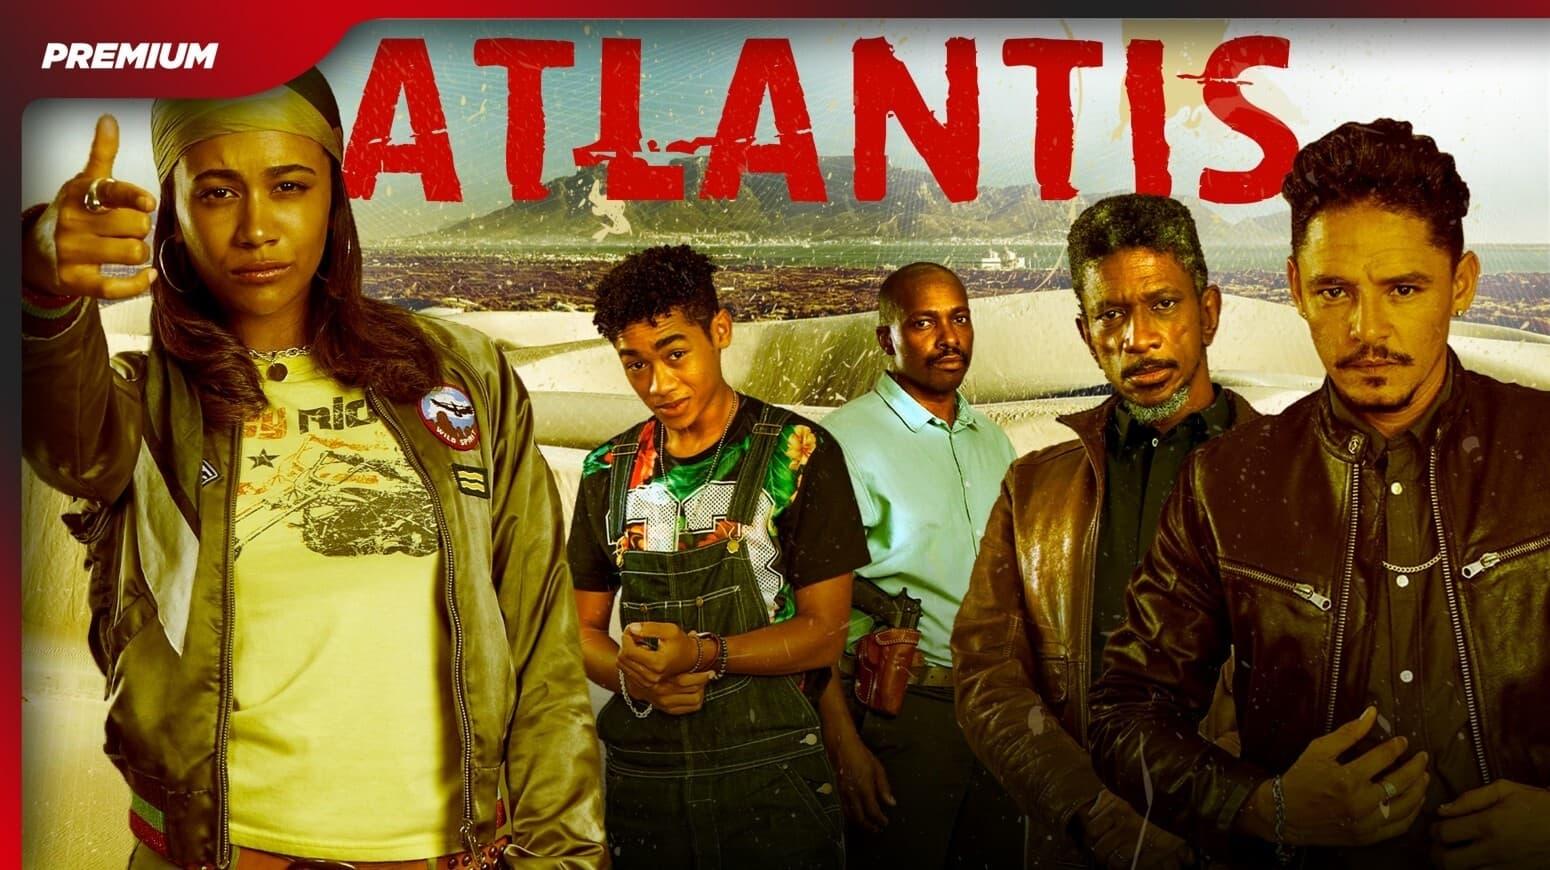 Atlantis (2021) Movie English Full Movie Watch Online Free